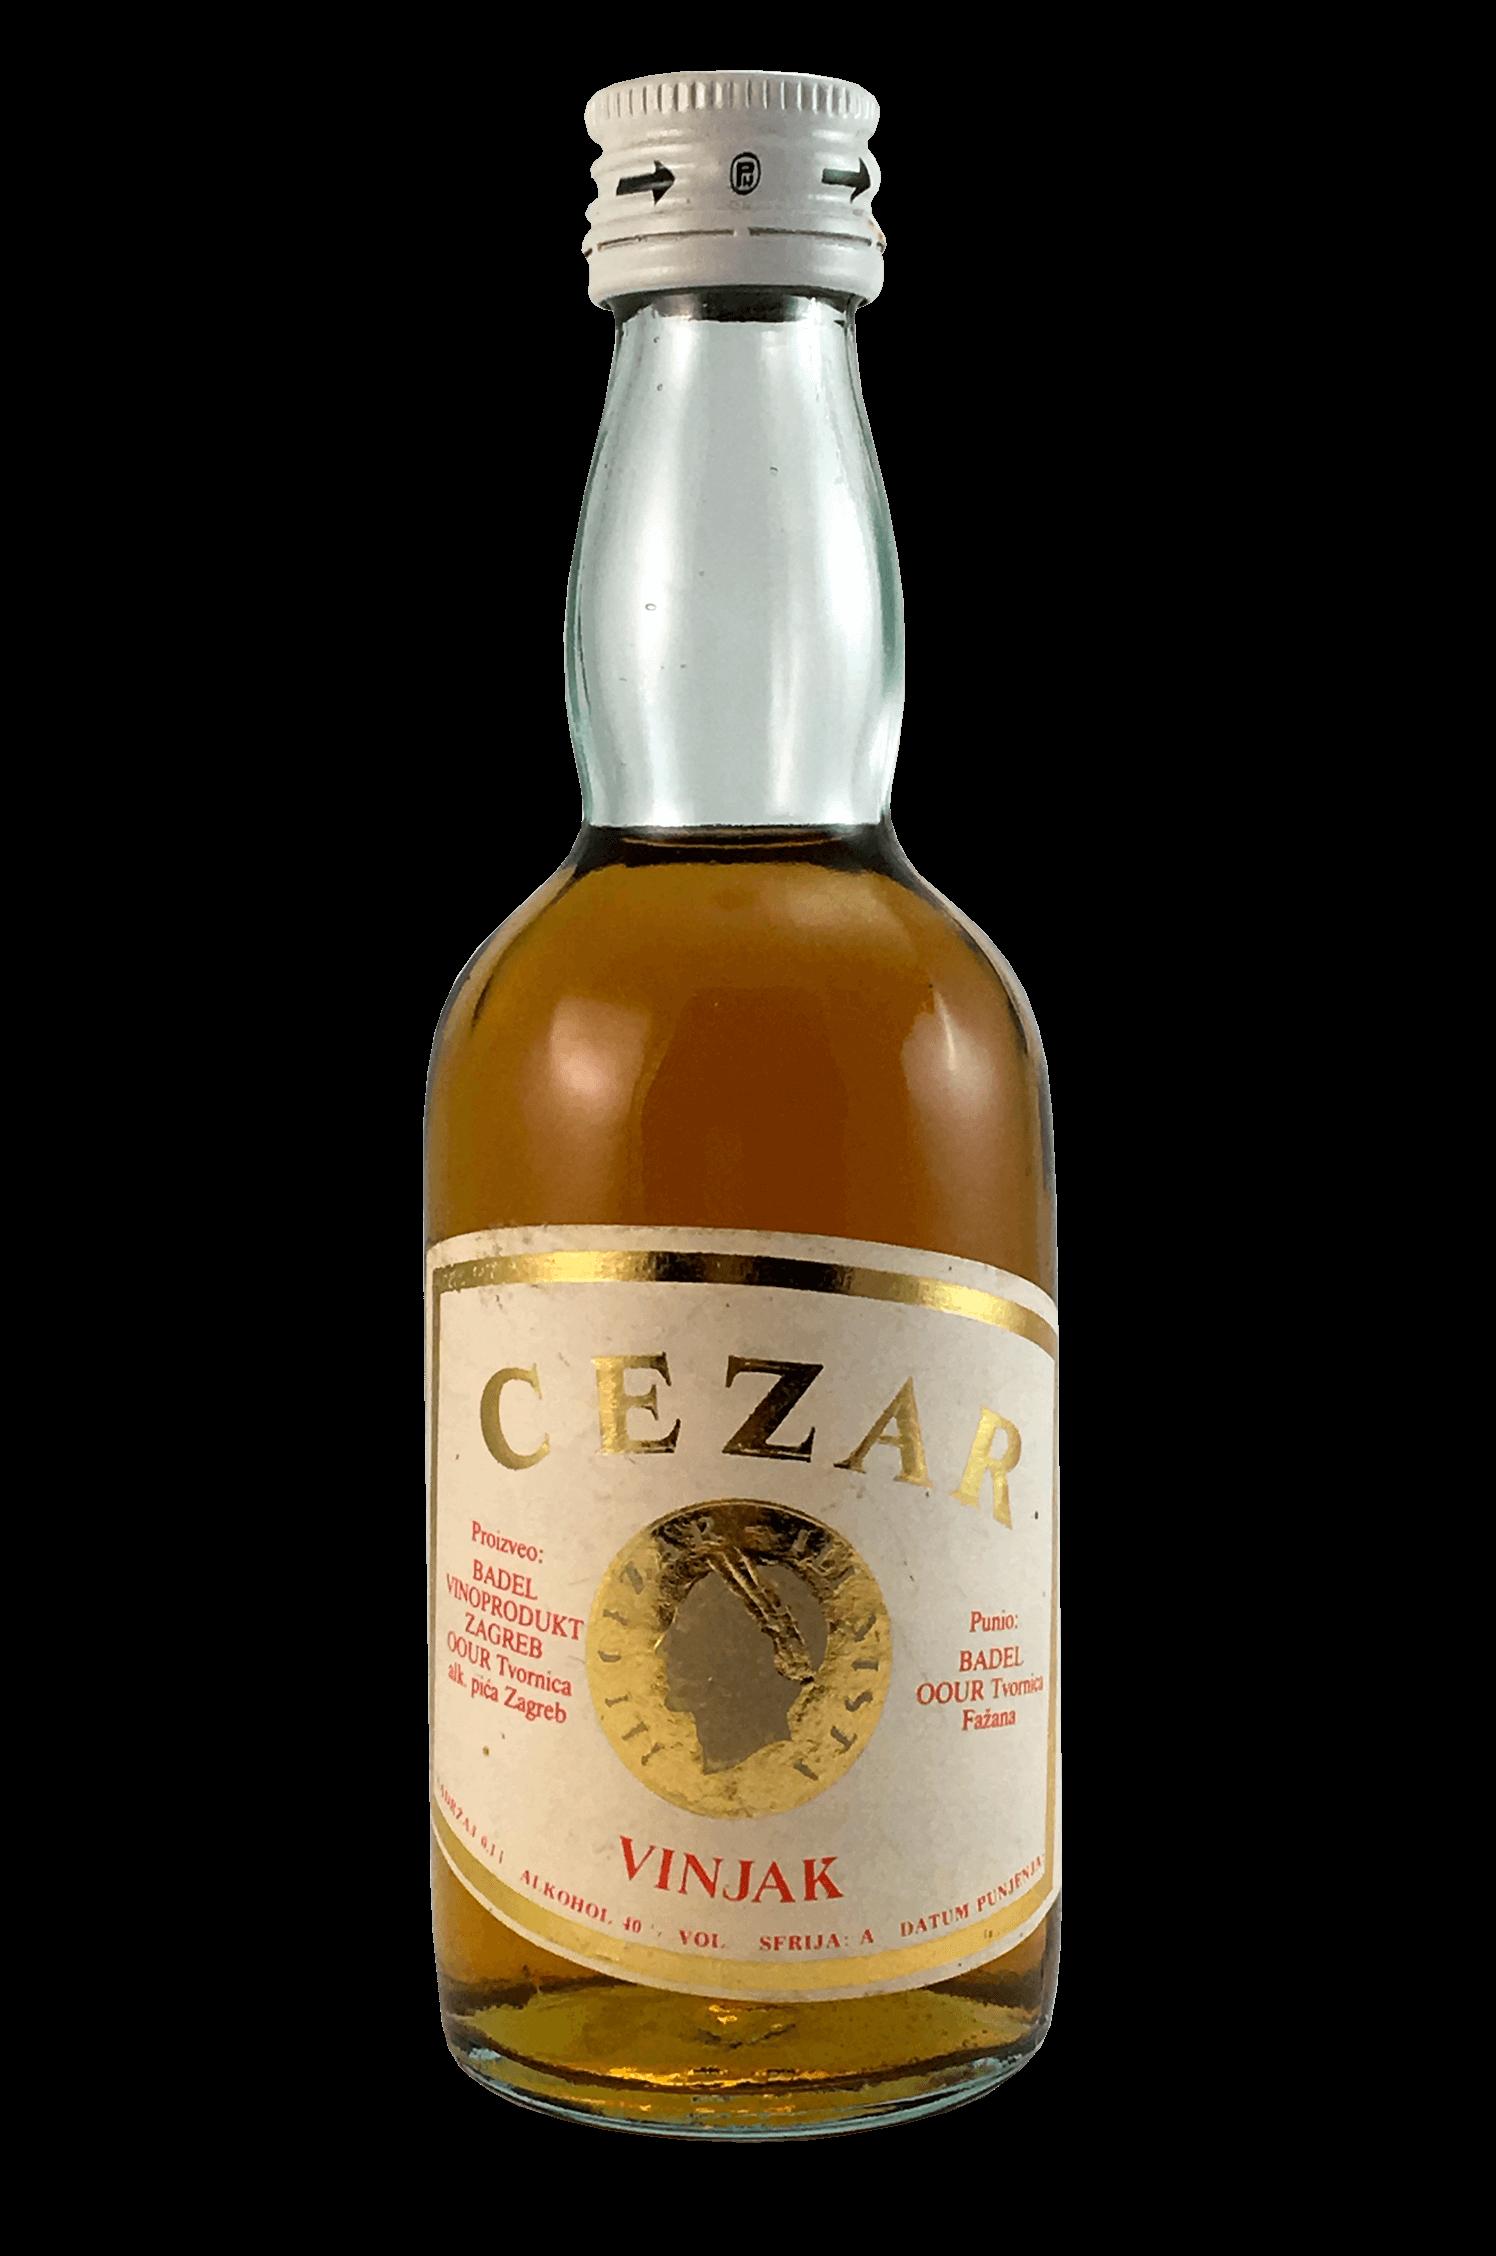 Cezar Vinjak